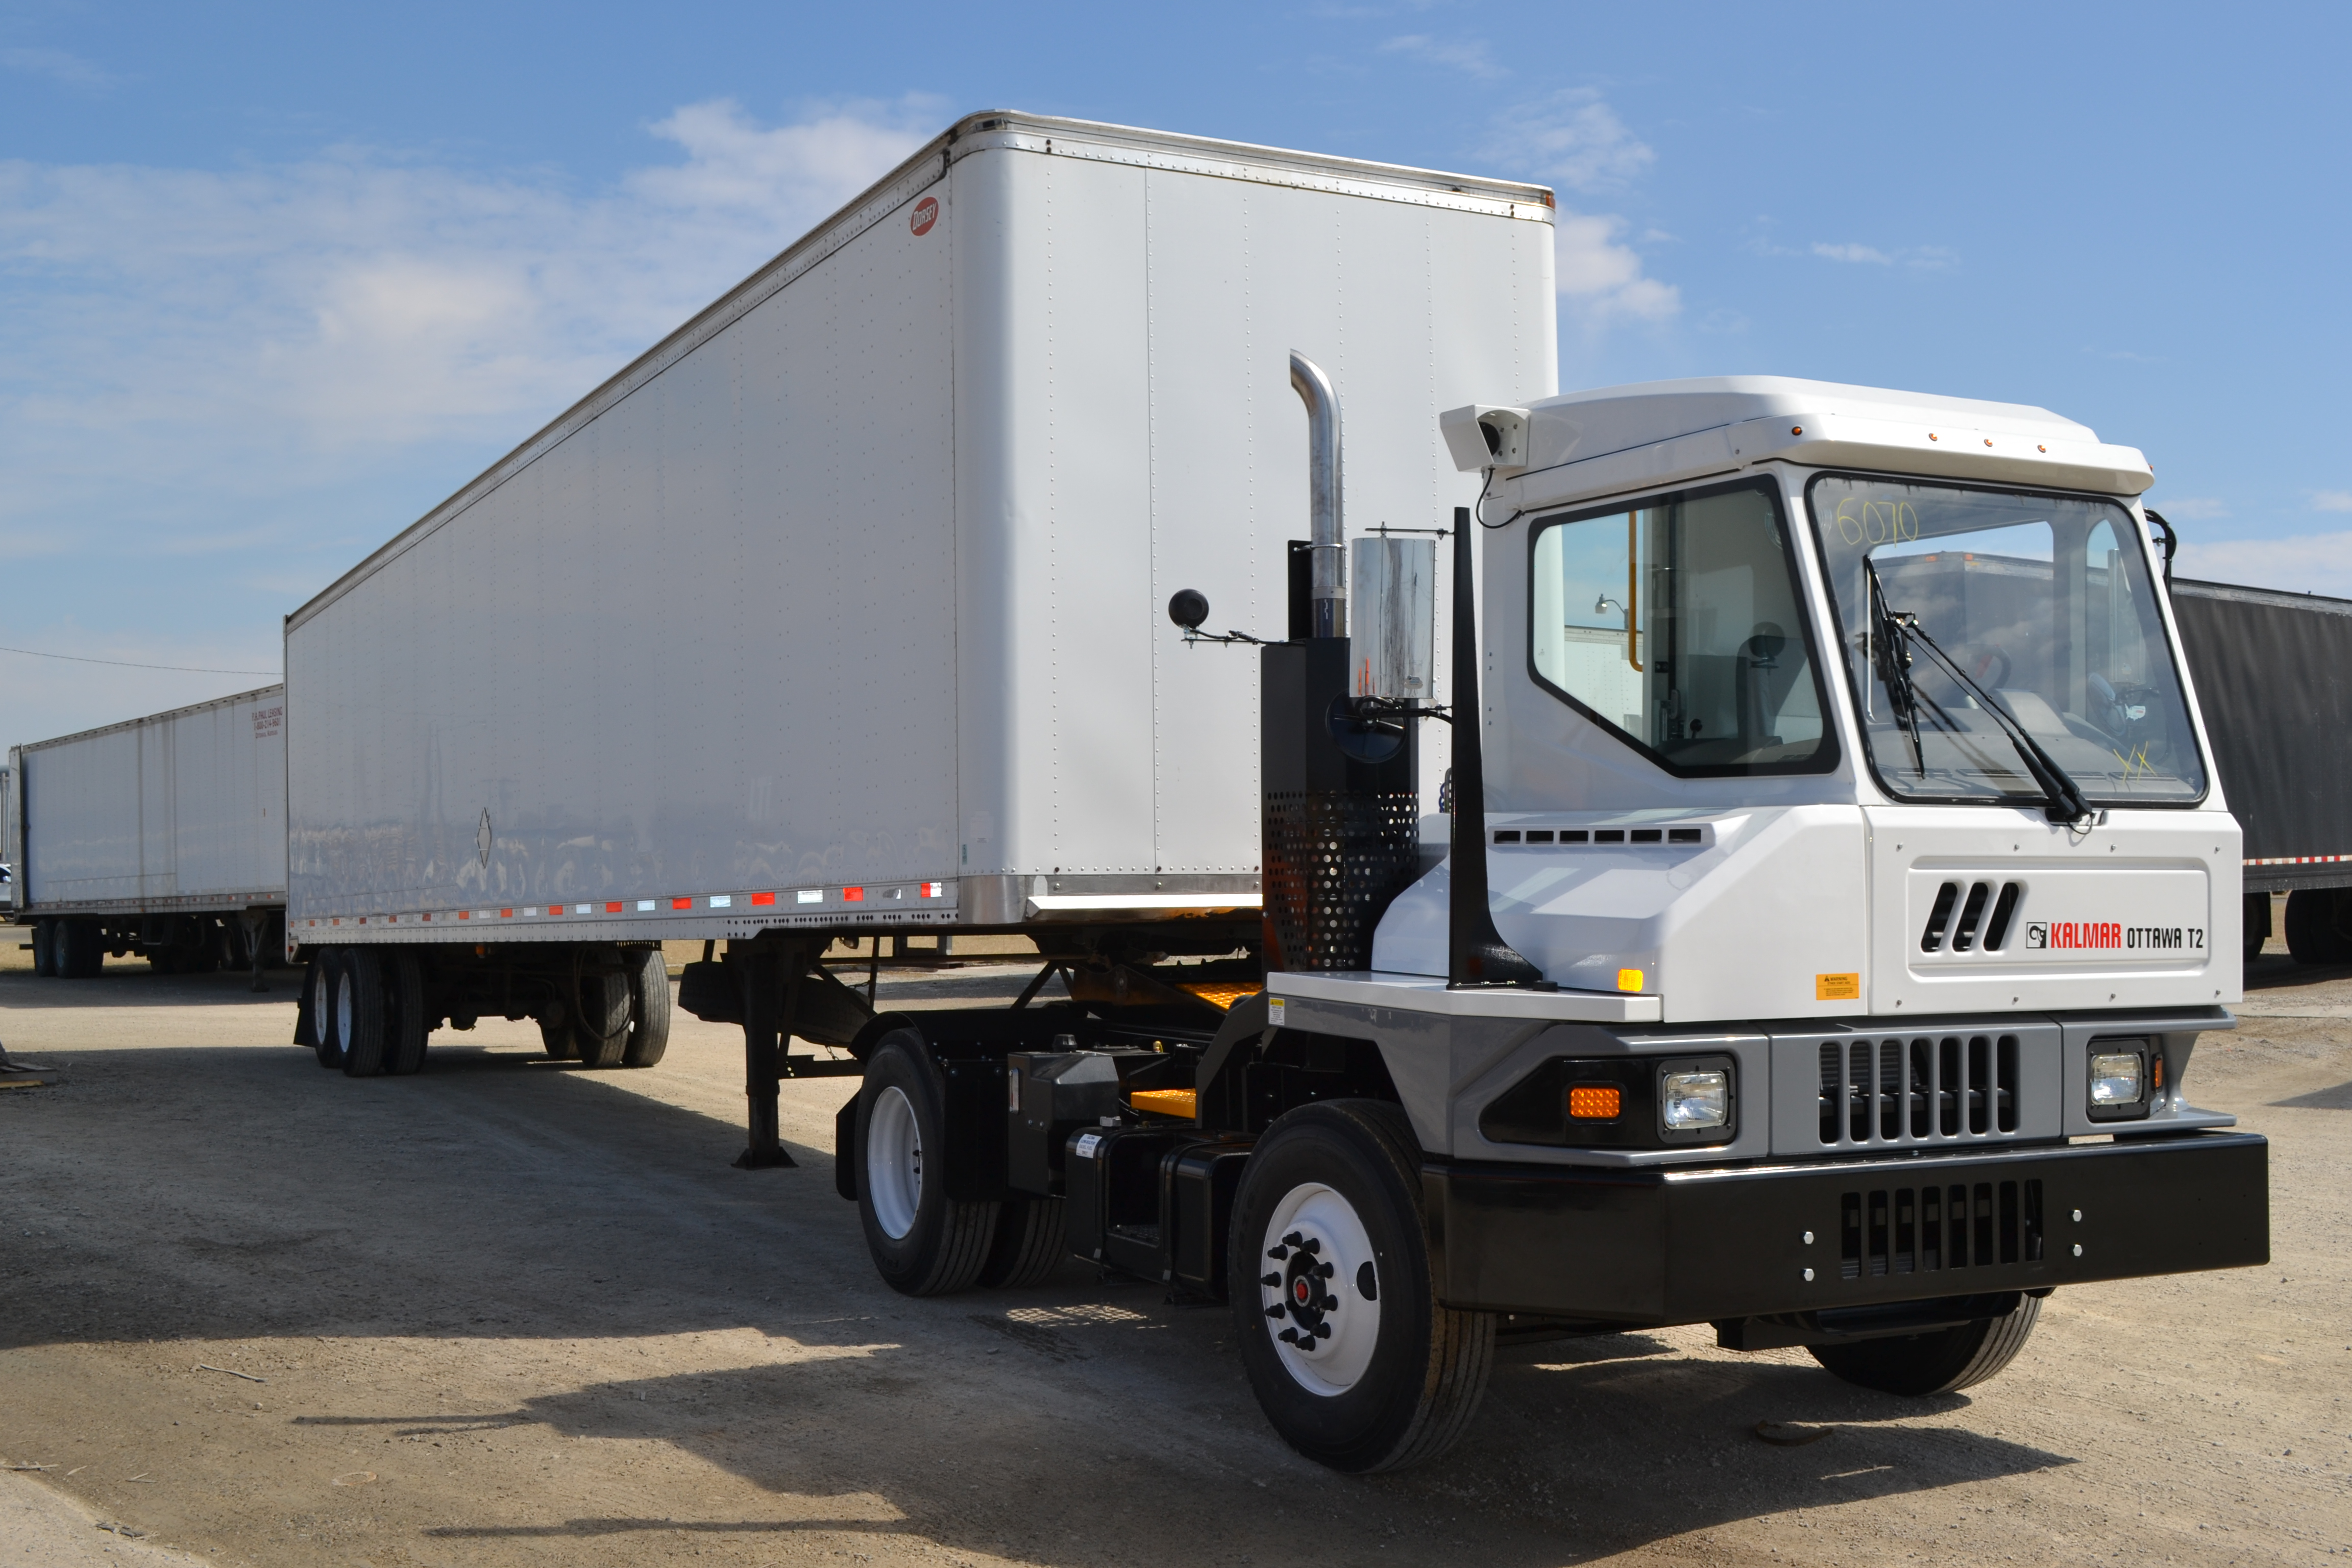 Kalmar To Deliver 60 Ottawa T2 Terminal Tractors To Rail